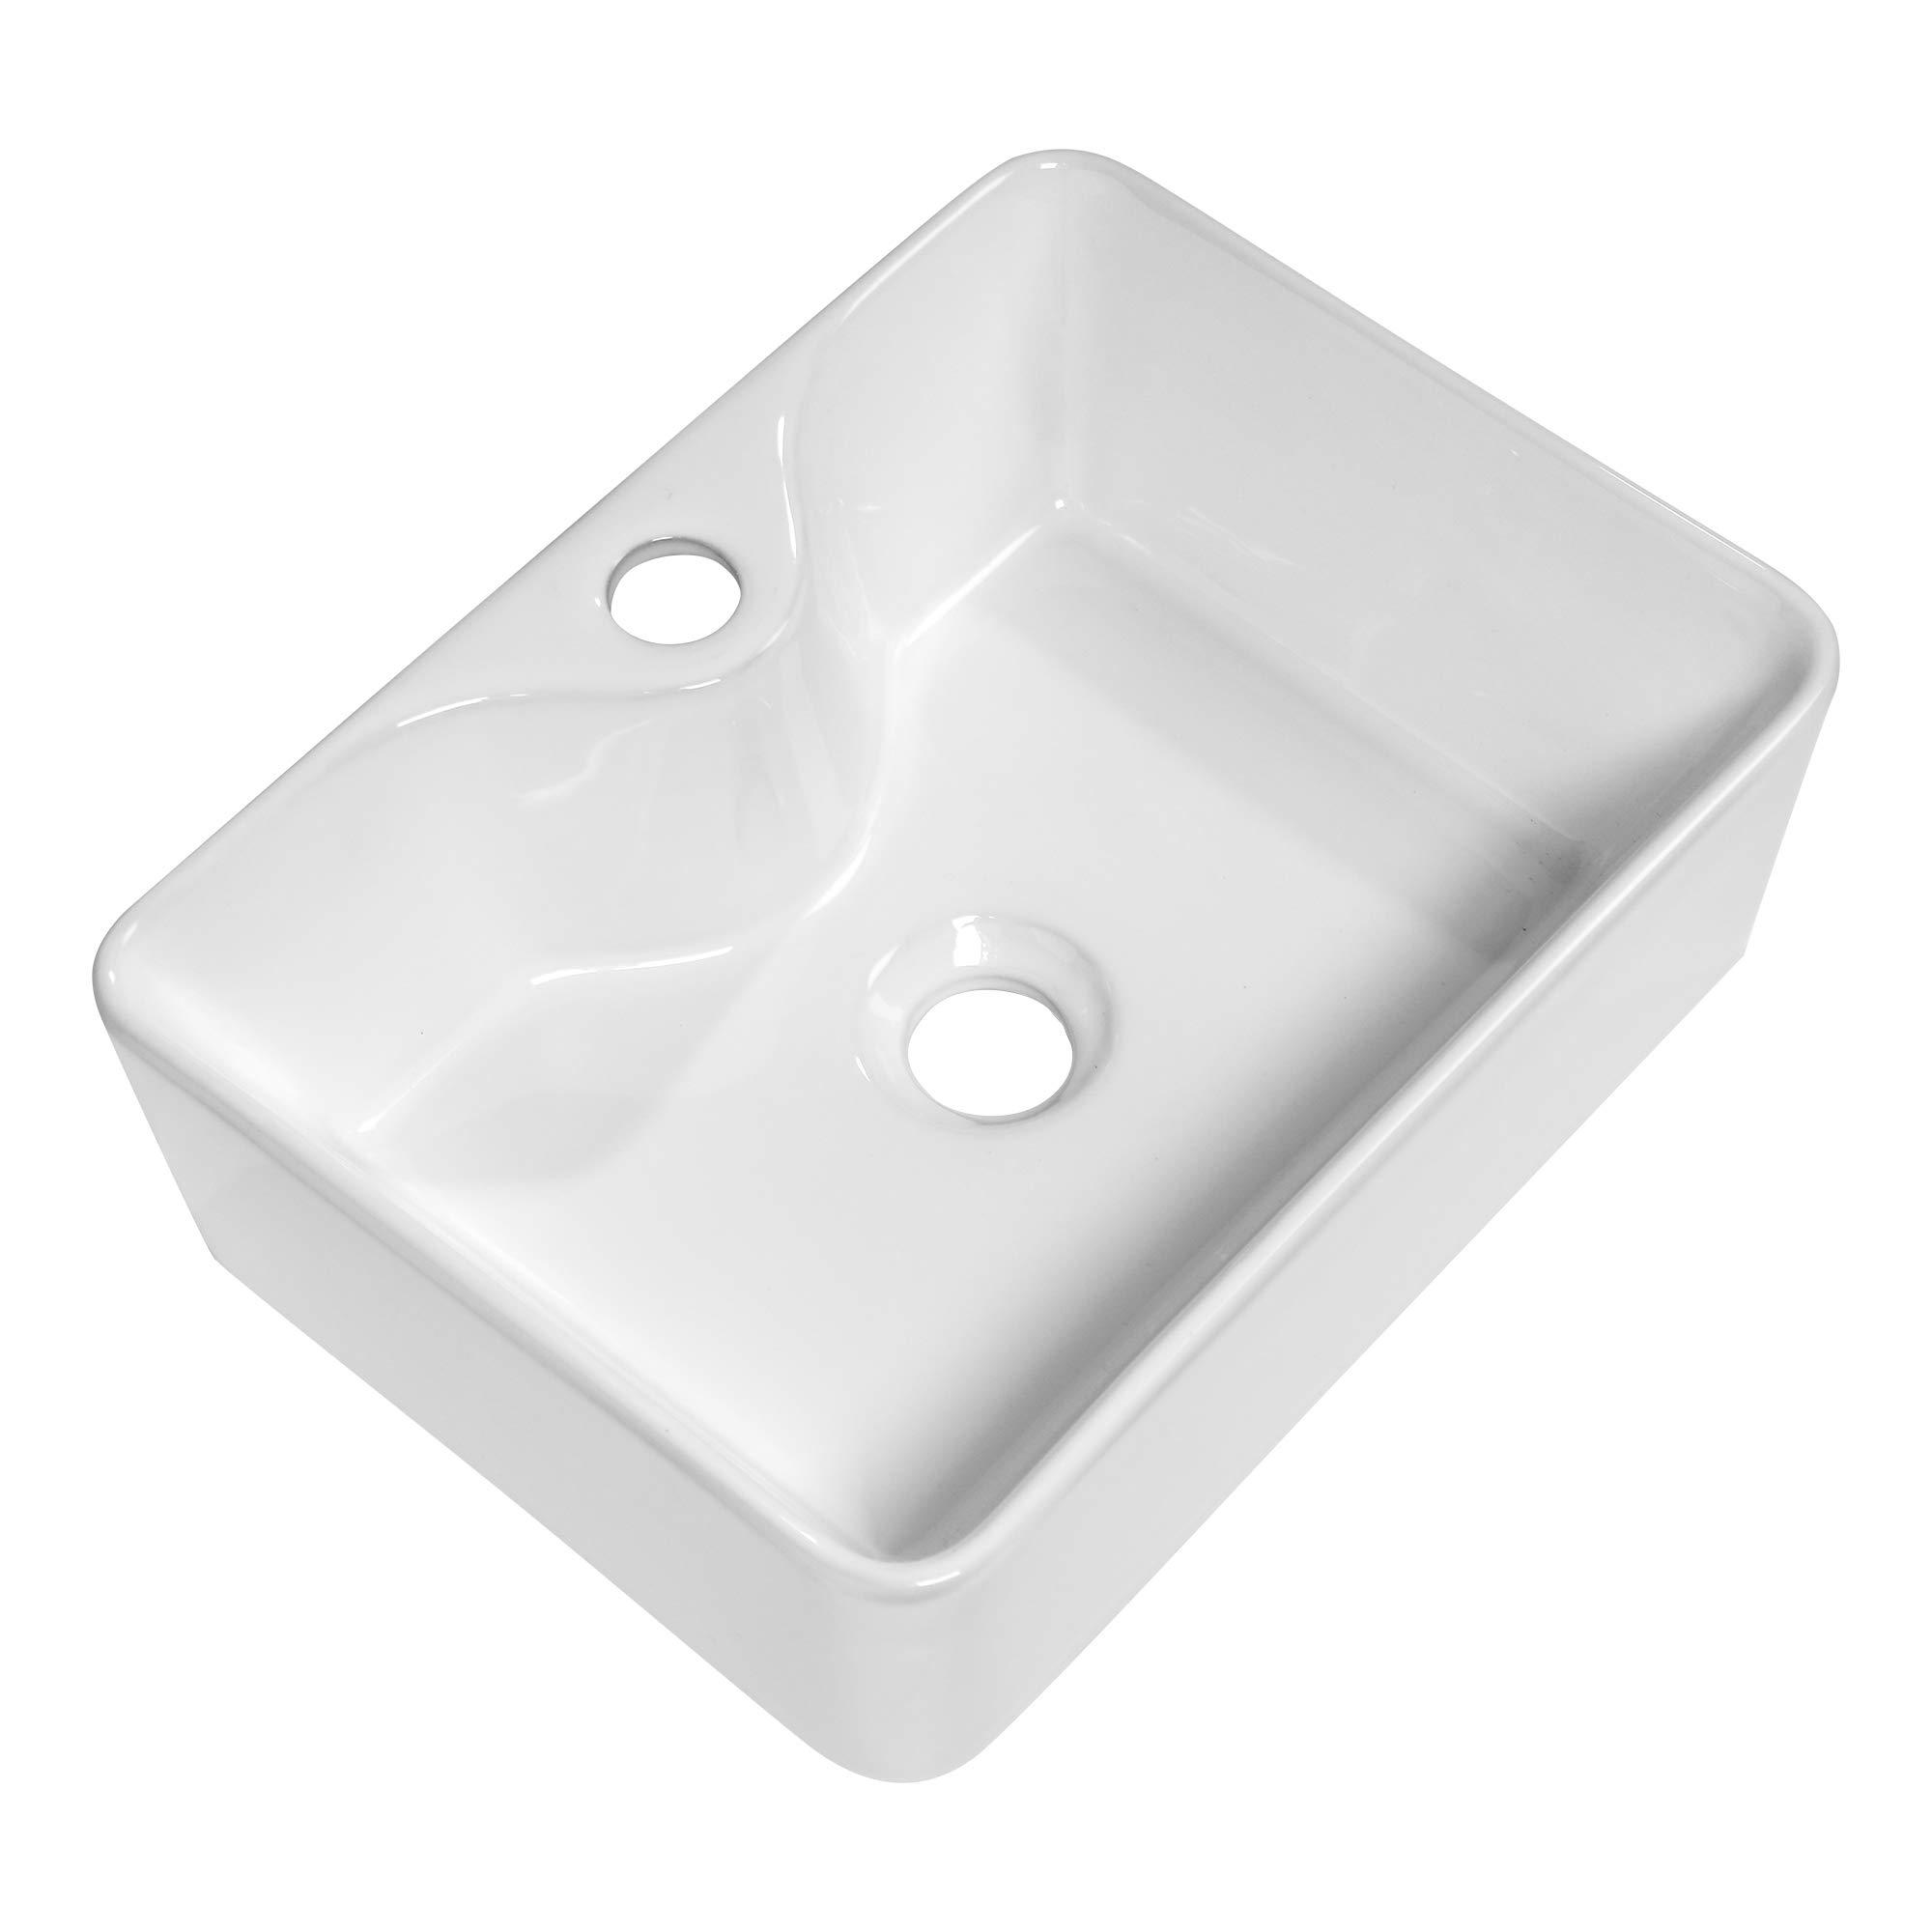 Vessel Sink Rectangular Kichae 16 X12 Modern Bathroom Rectangle Above Counter White Porcelain Ceramic Vessel Vanity Sink Art Basin With Faucet Hole